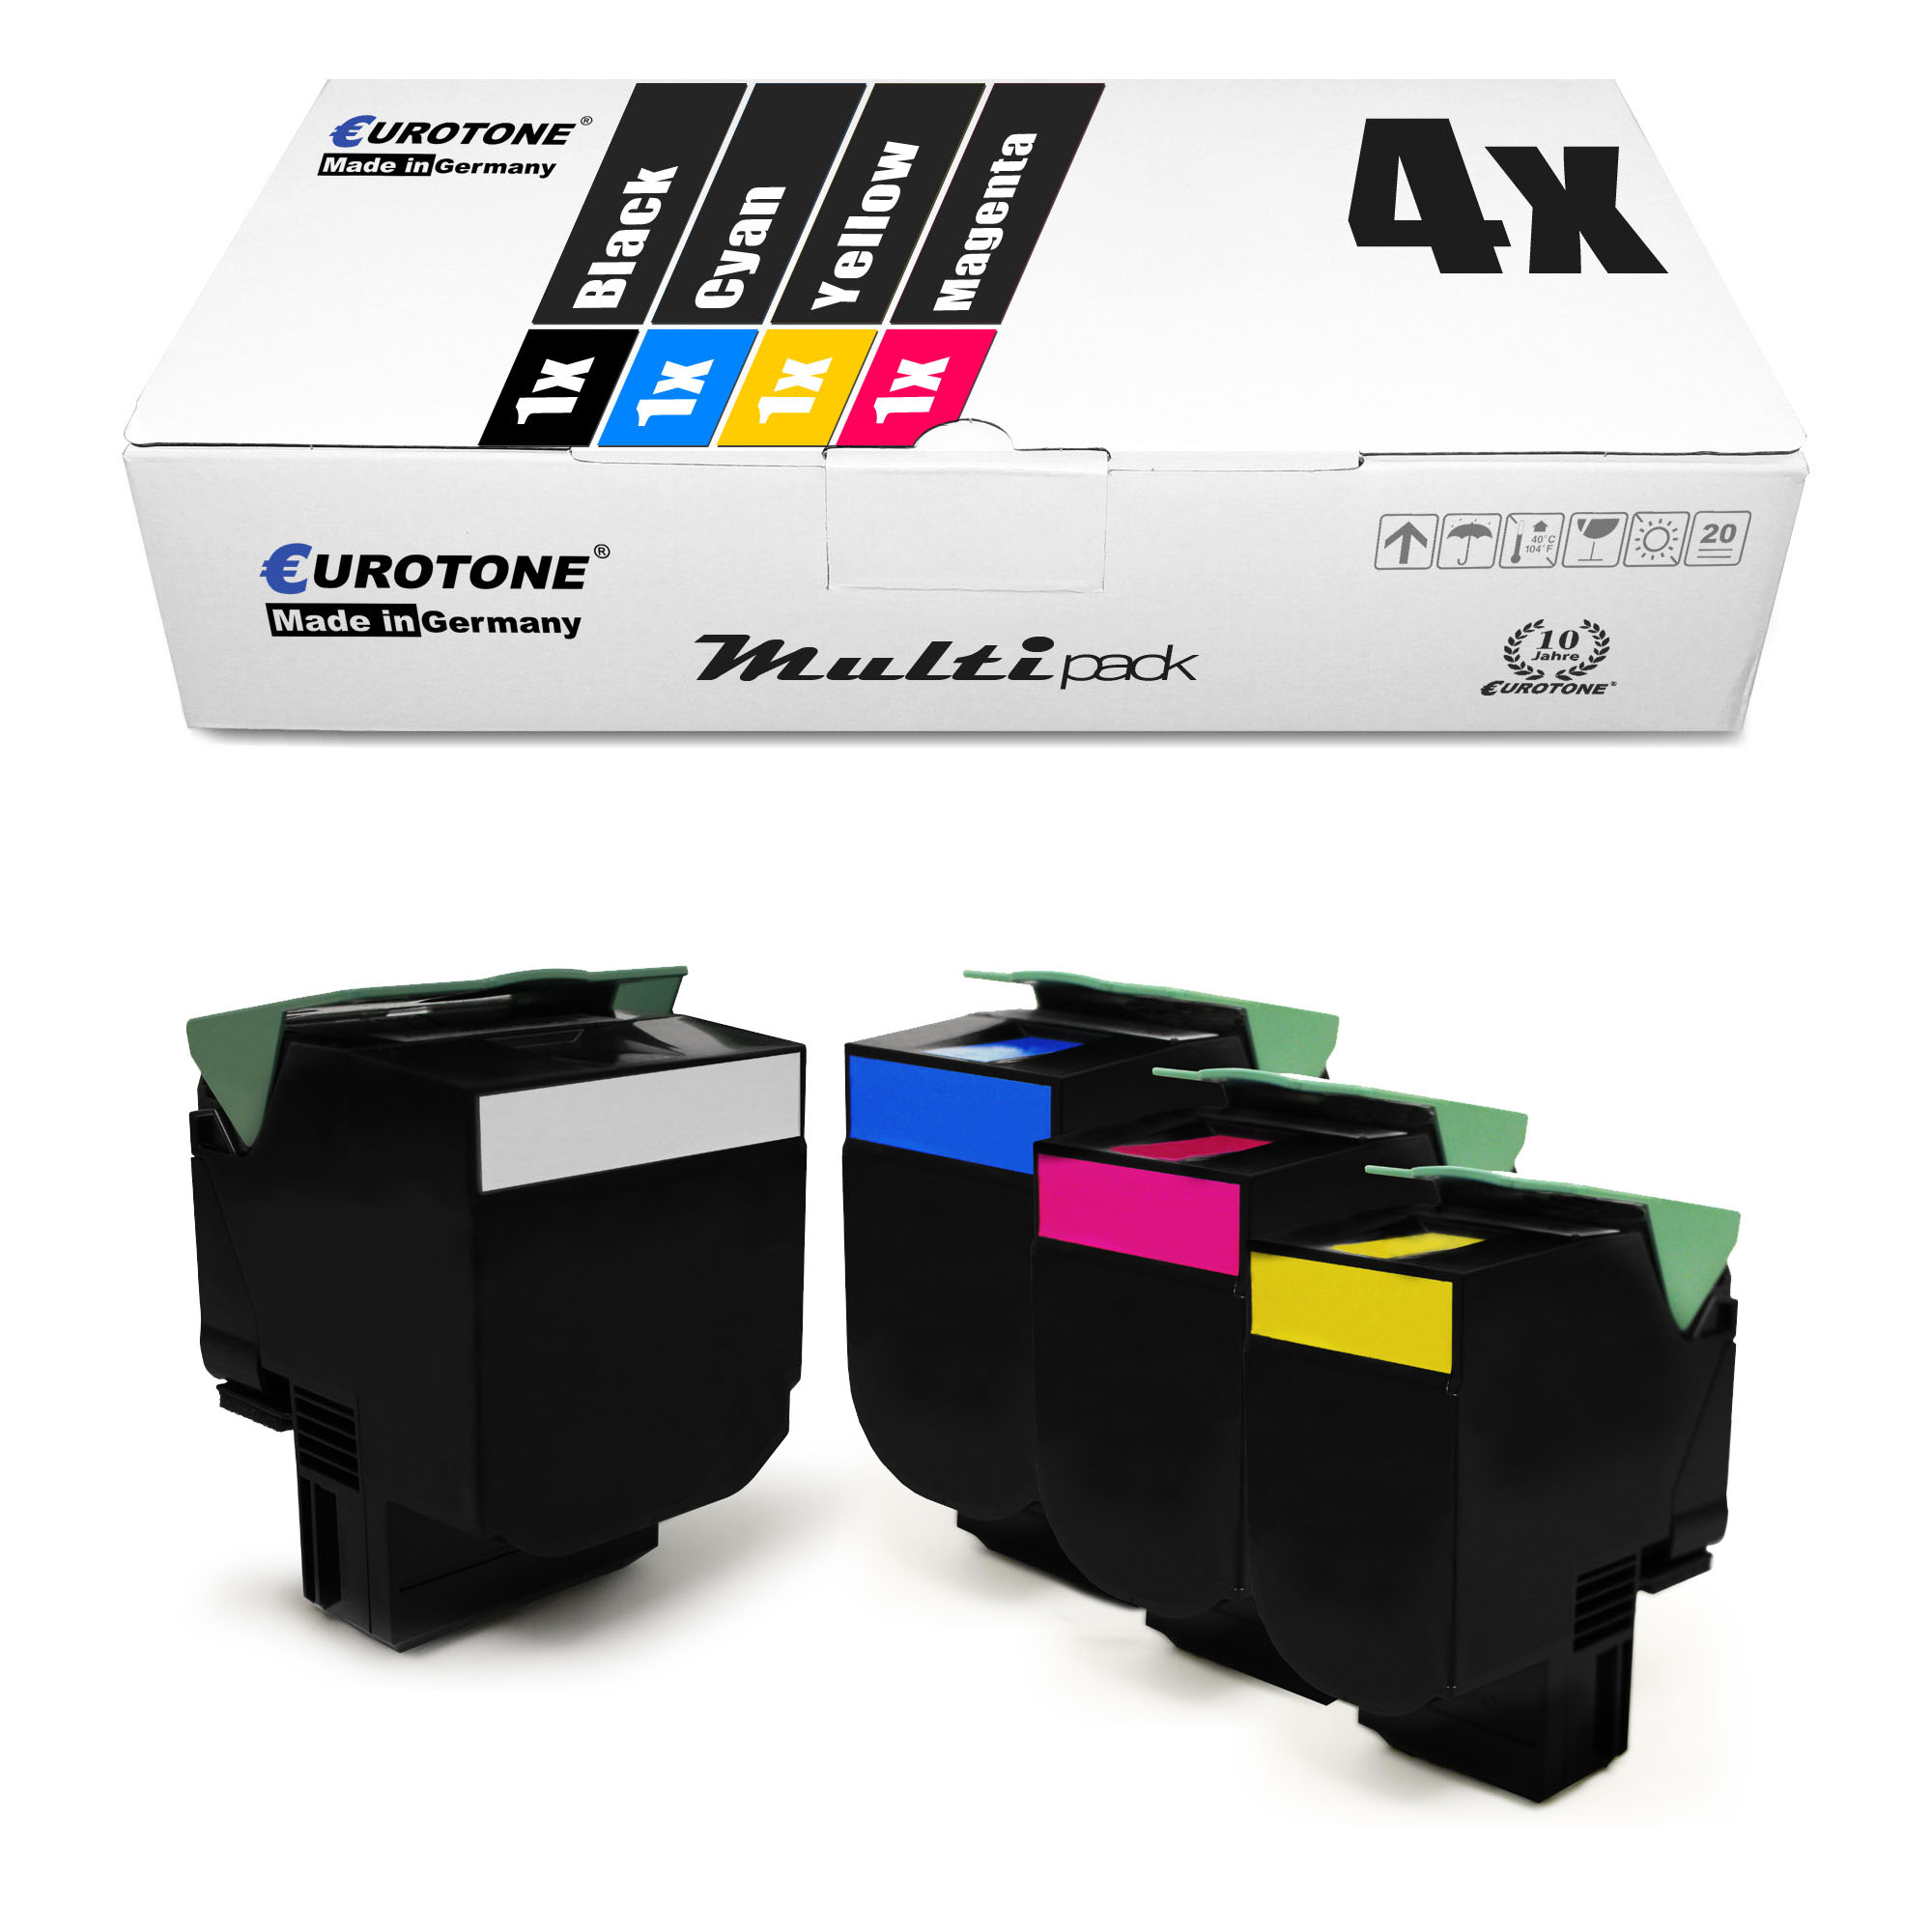 4x-Eco-Toner-XXL-Pour-LEXMARK-cs-510-dte-cs-410-dn-cs-310-dn-cs-310-n-cs-410-dtn